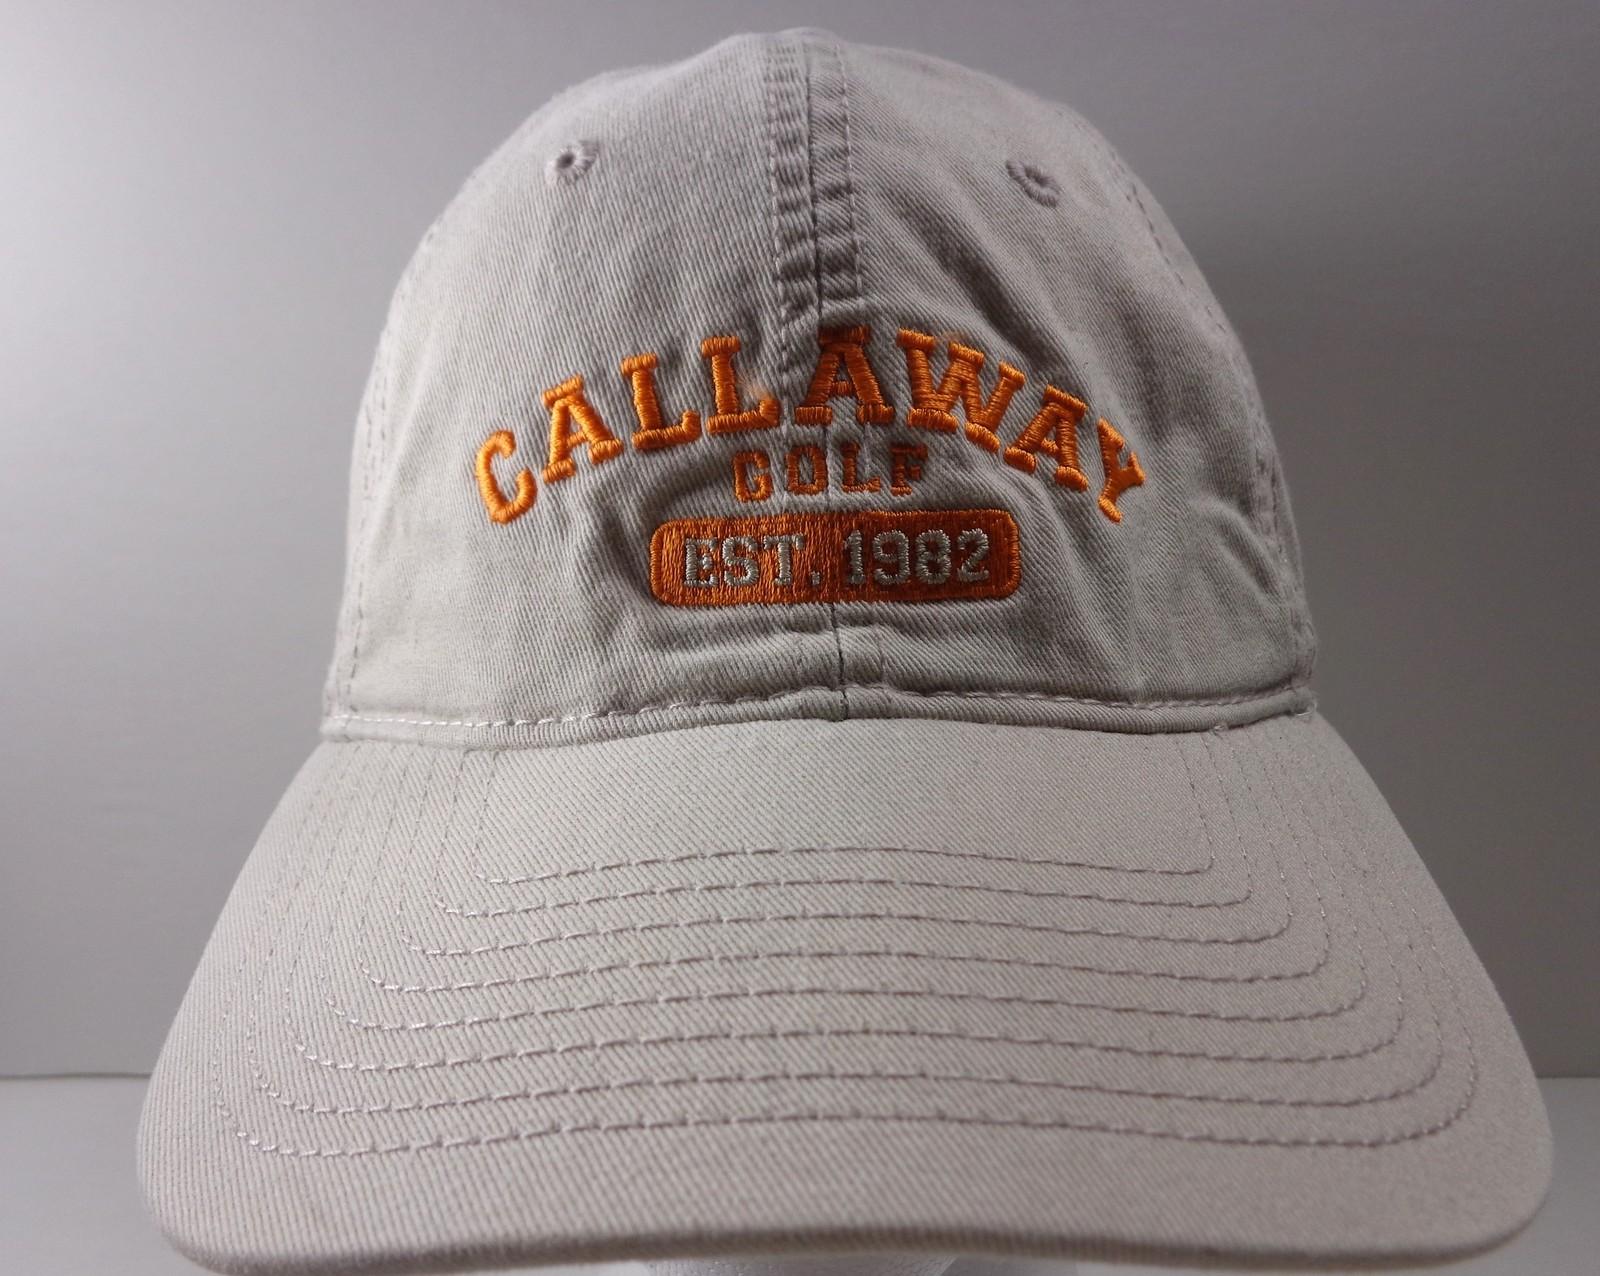 22eec3cdd98 Callaway Golf Adjustable Baseball Cap Hat and 50 similar items. Dsc02607